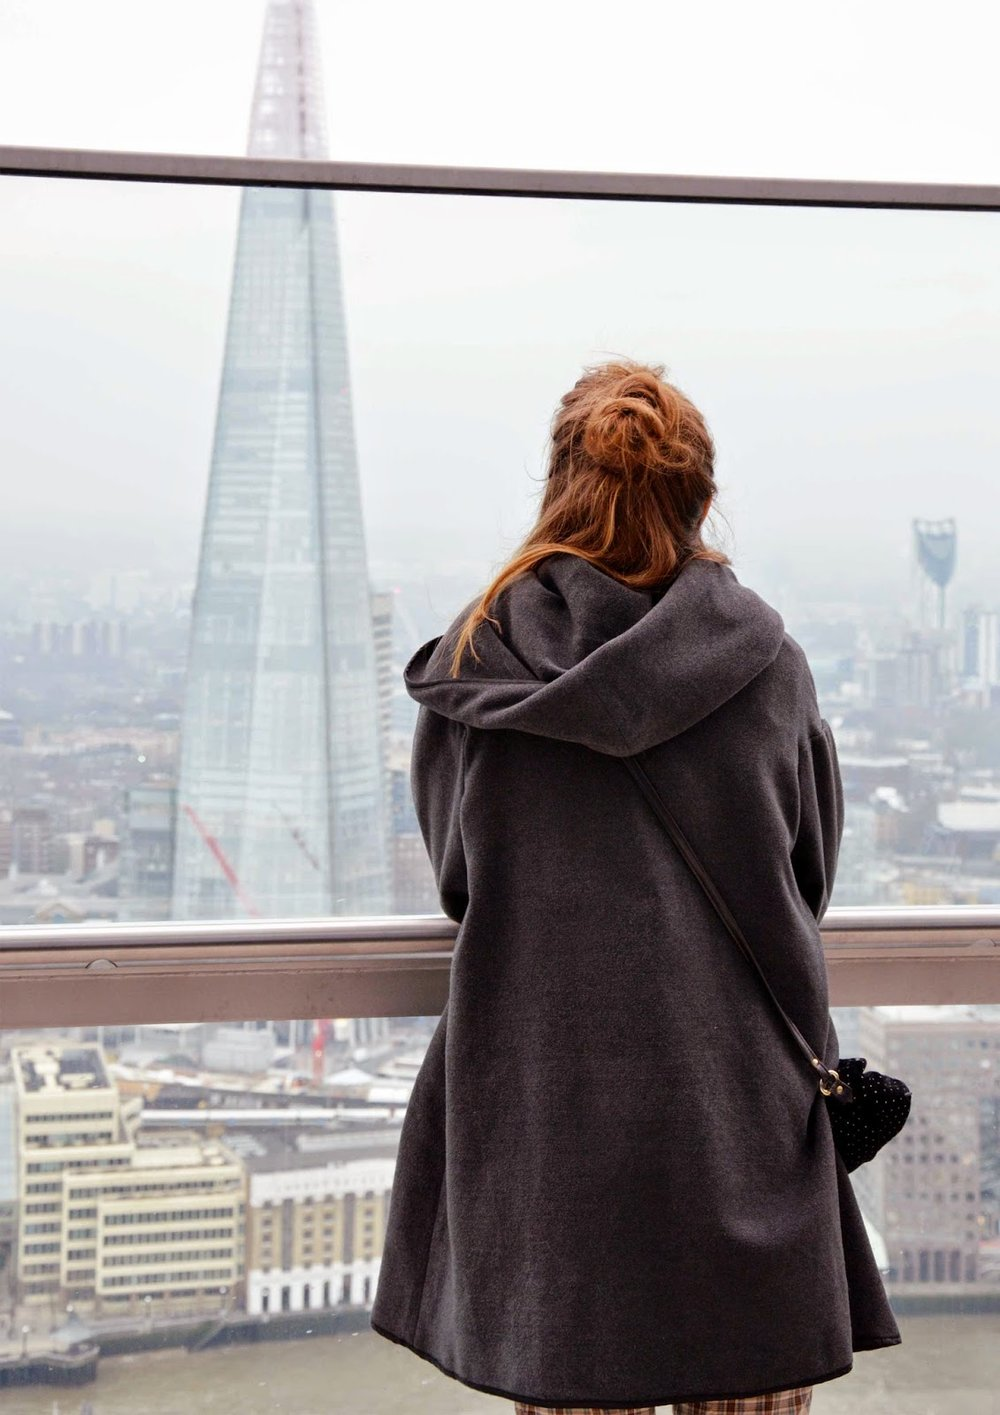 city-london-londres-walkie talkie-rascacielos-paula